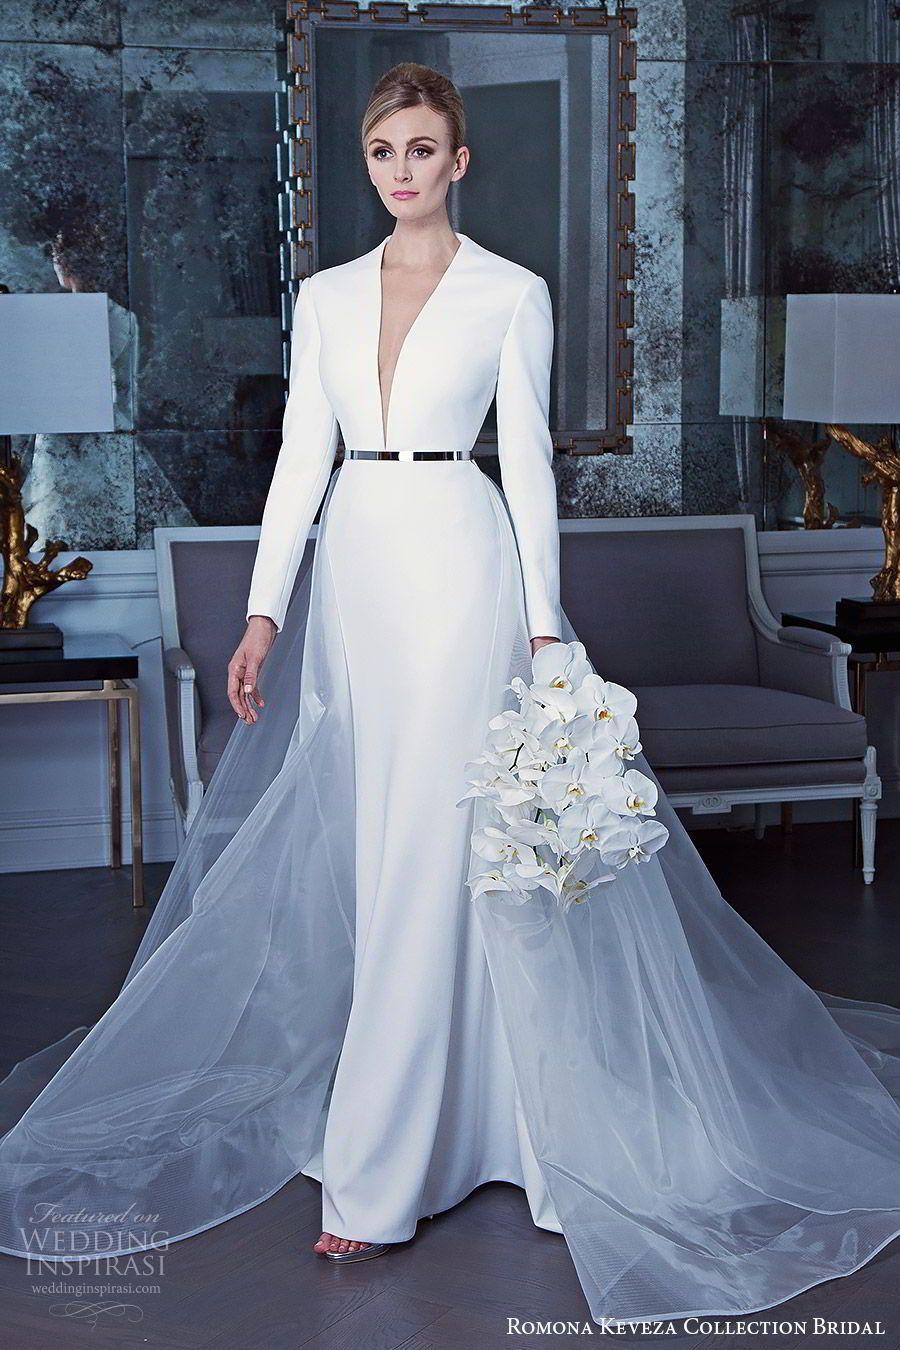 Romona keveza collection bridal fall wedding dresses noong